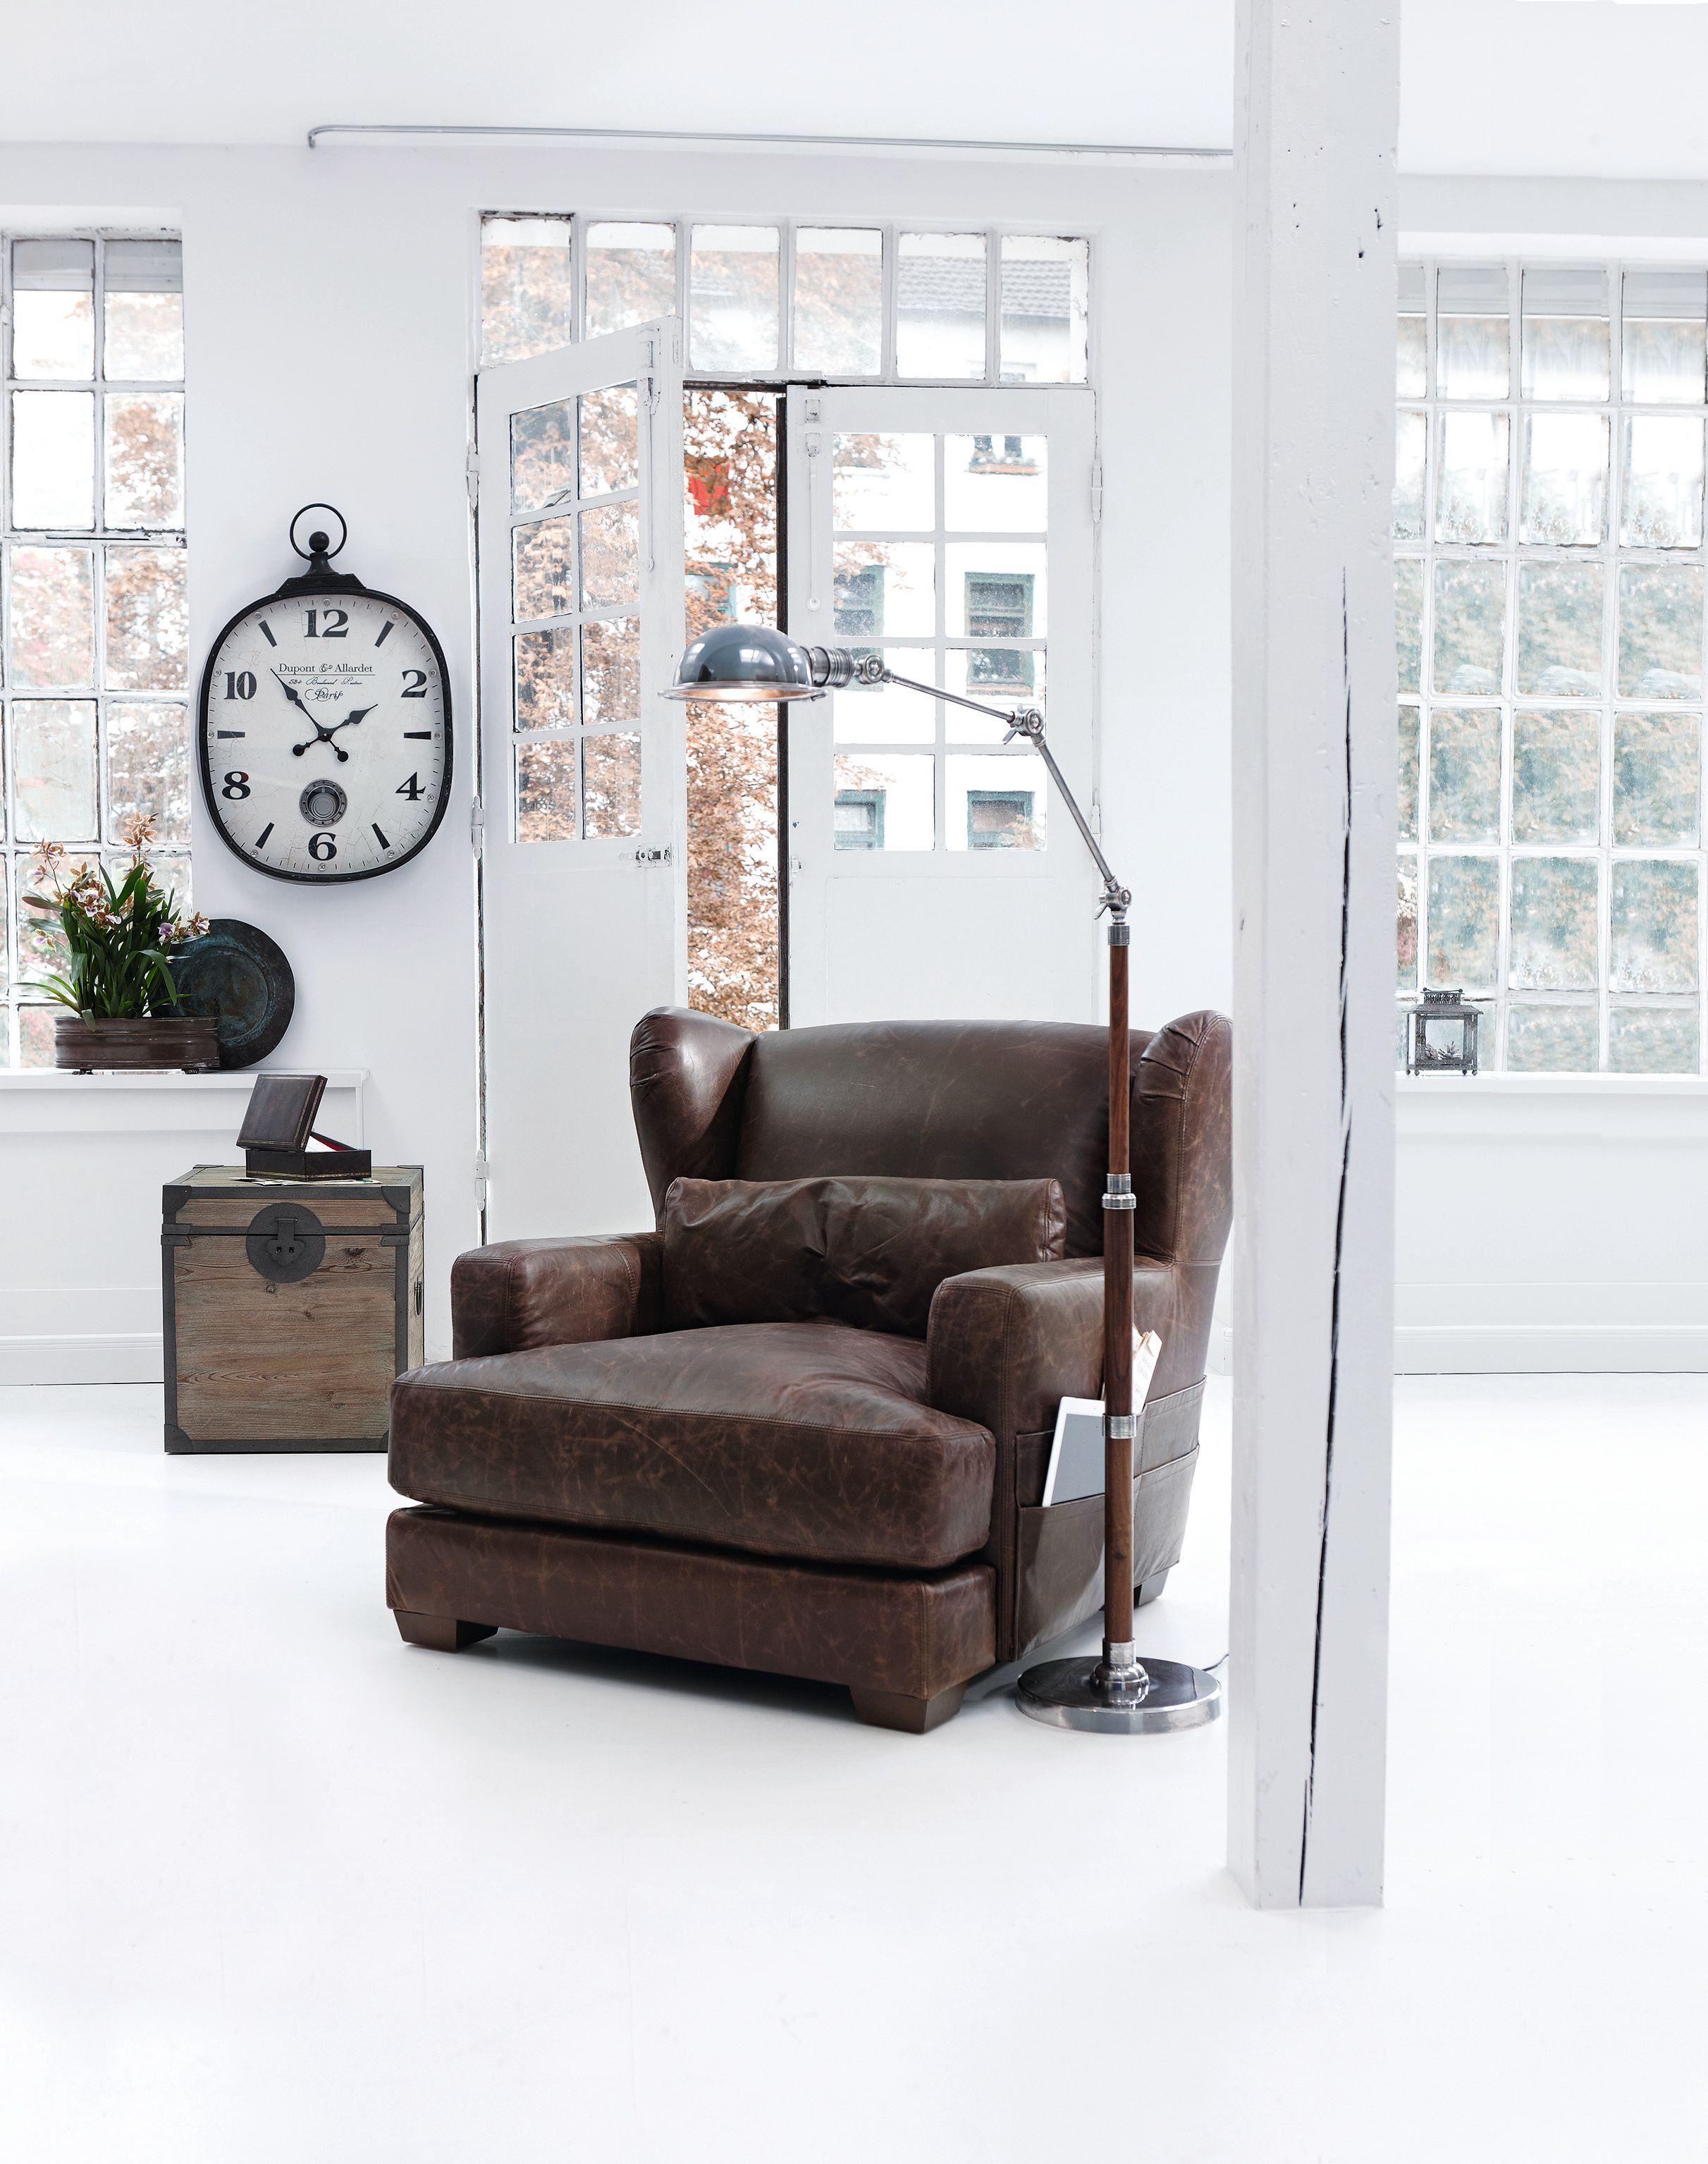 sessel orlando truhe colorado loberon wohnen im industrial stil pinterest industrial. Black Bedroom Furniture Sets. Home Design Ideas